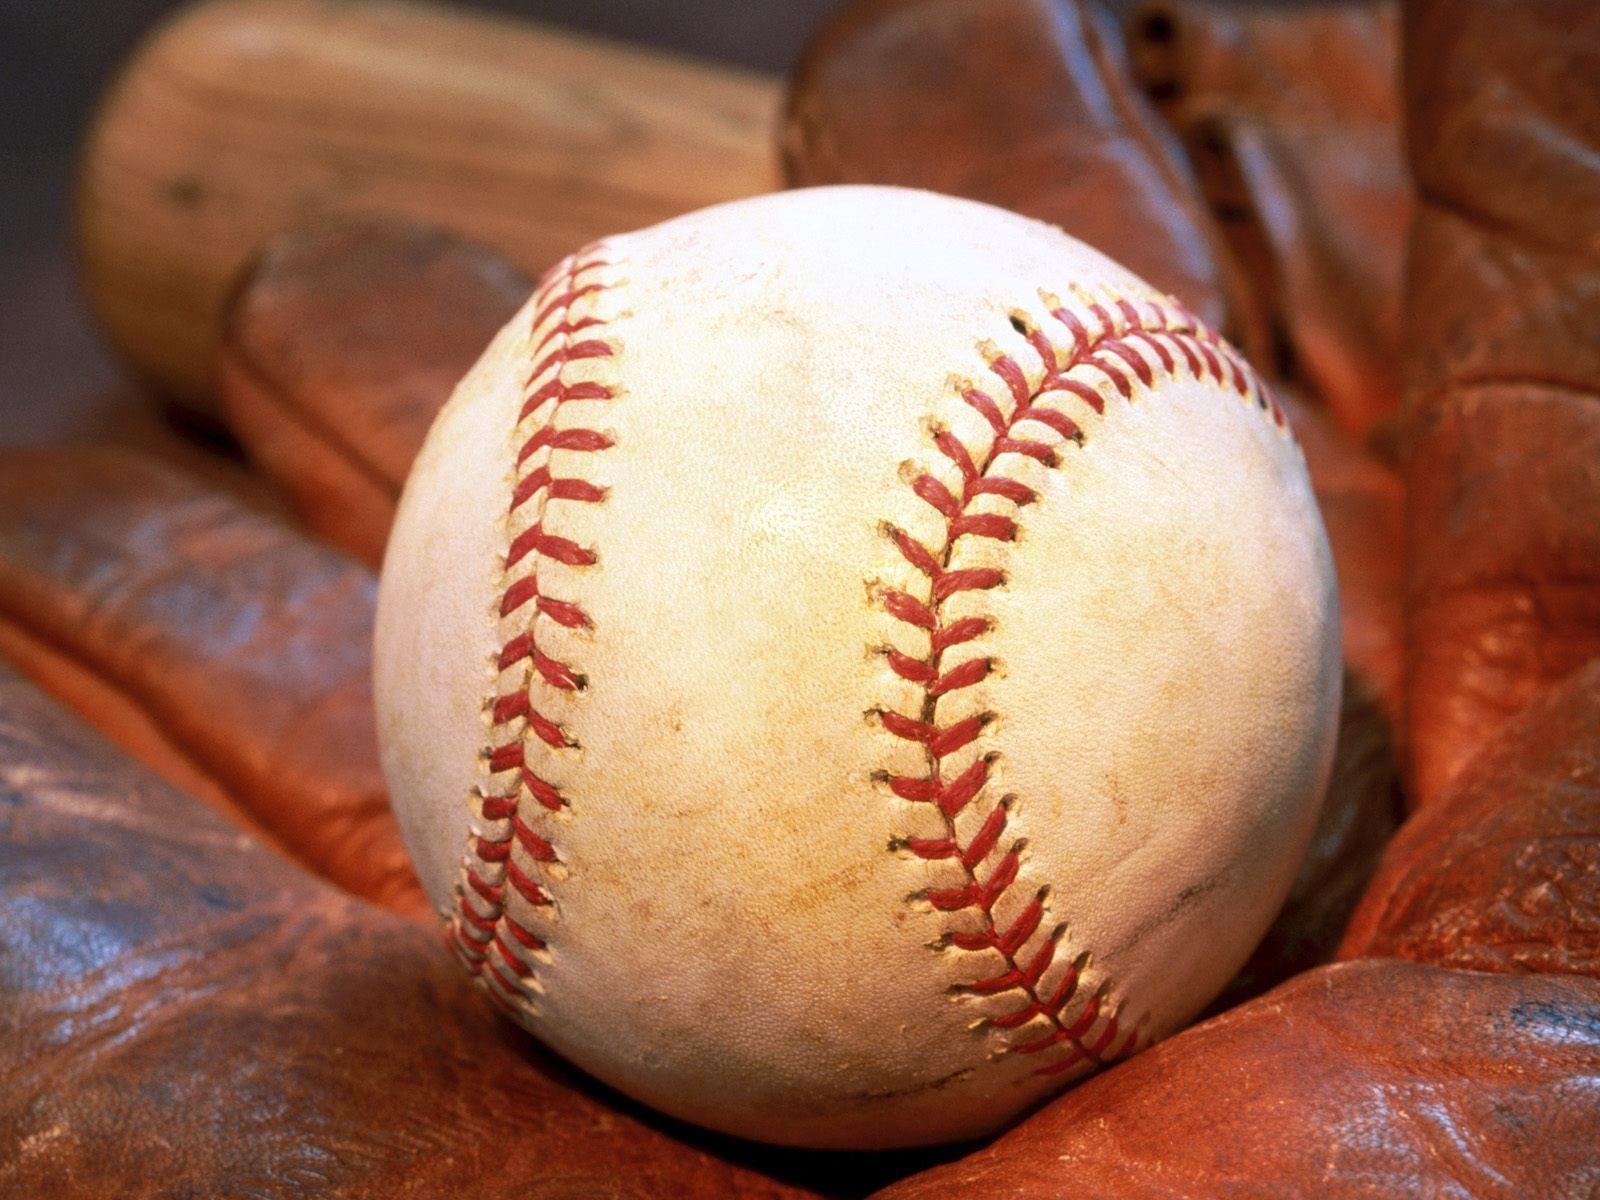 baseball and glove wallpaper 59877